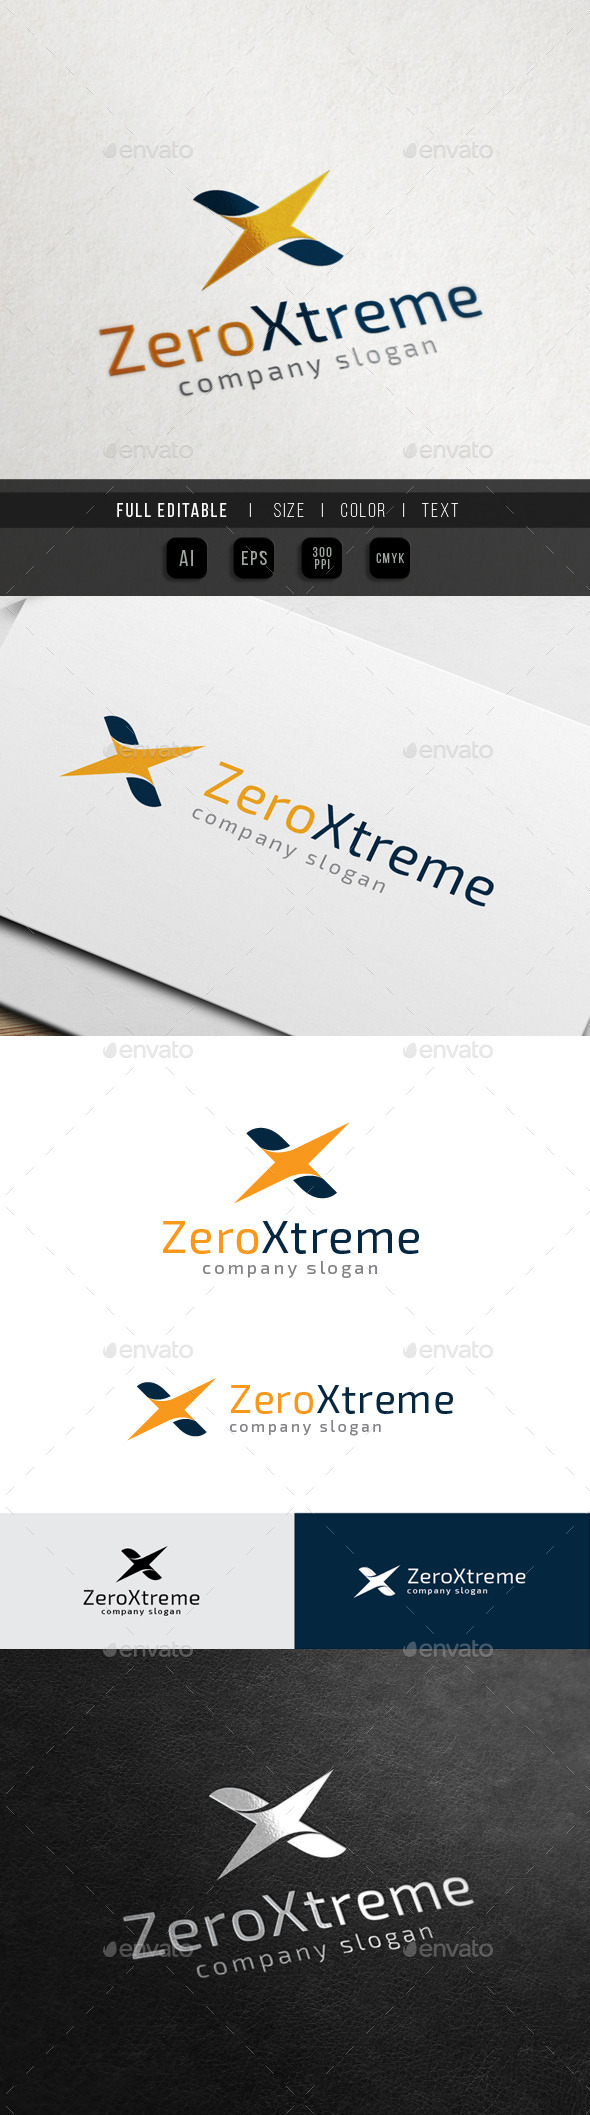 Xtreme Z Game - Extreme Sport